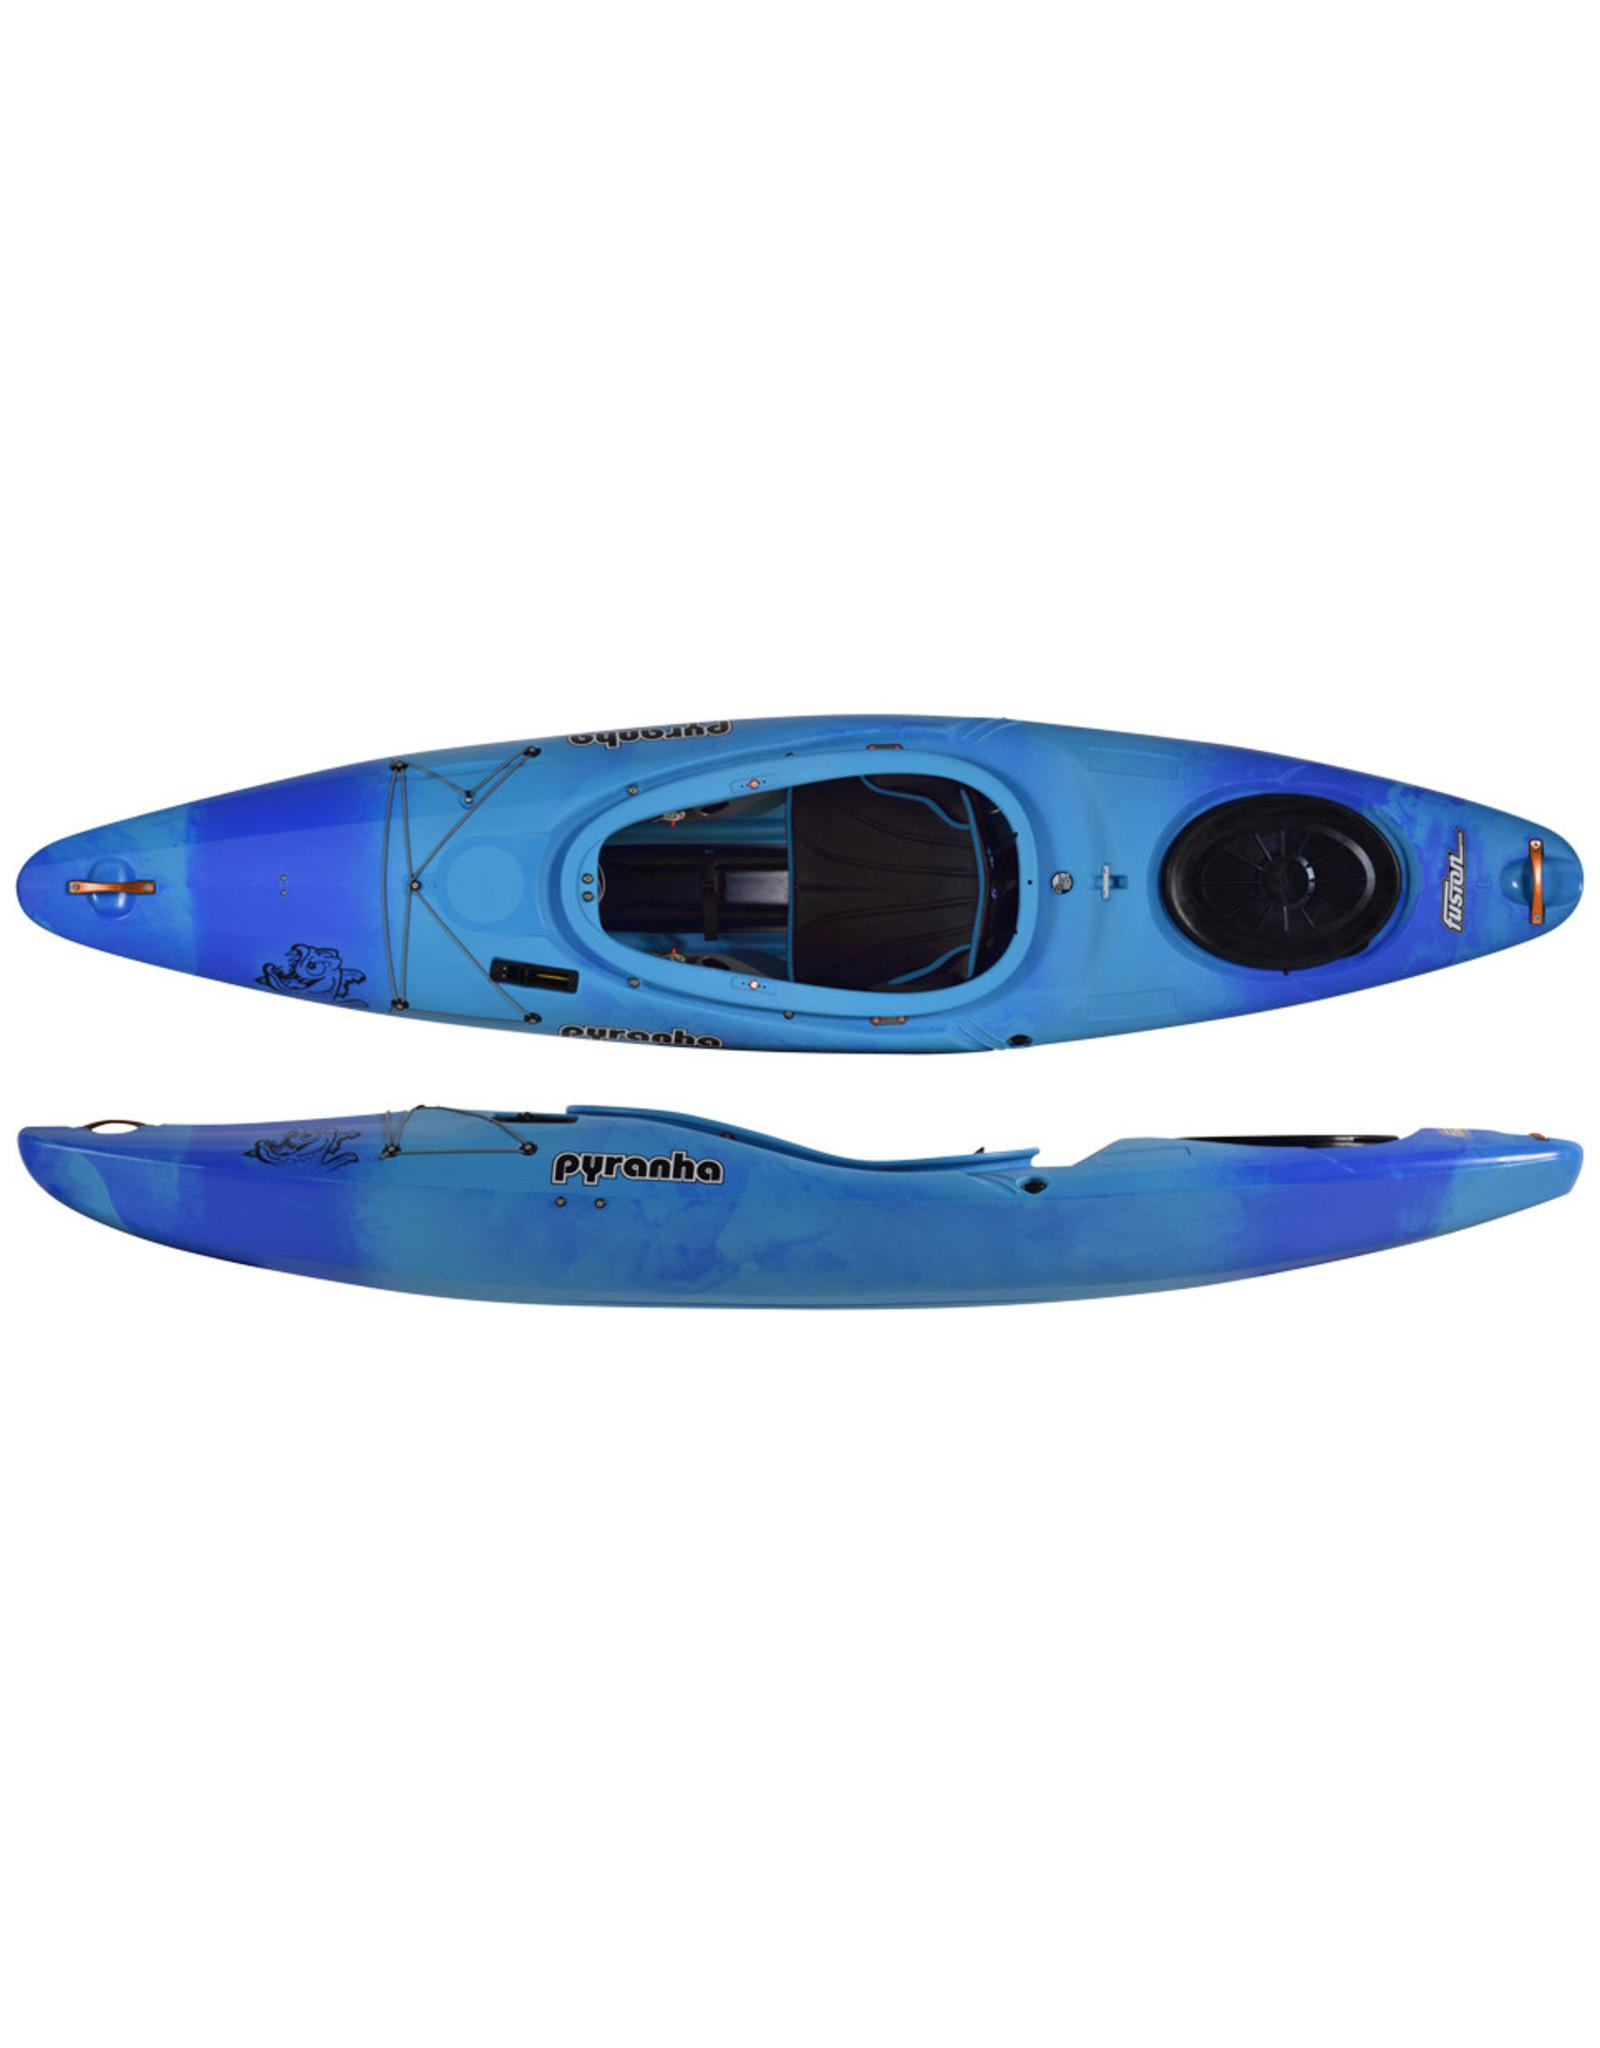 Pyranha Pyranha kayak Fusion II Stout 2